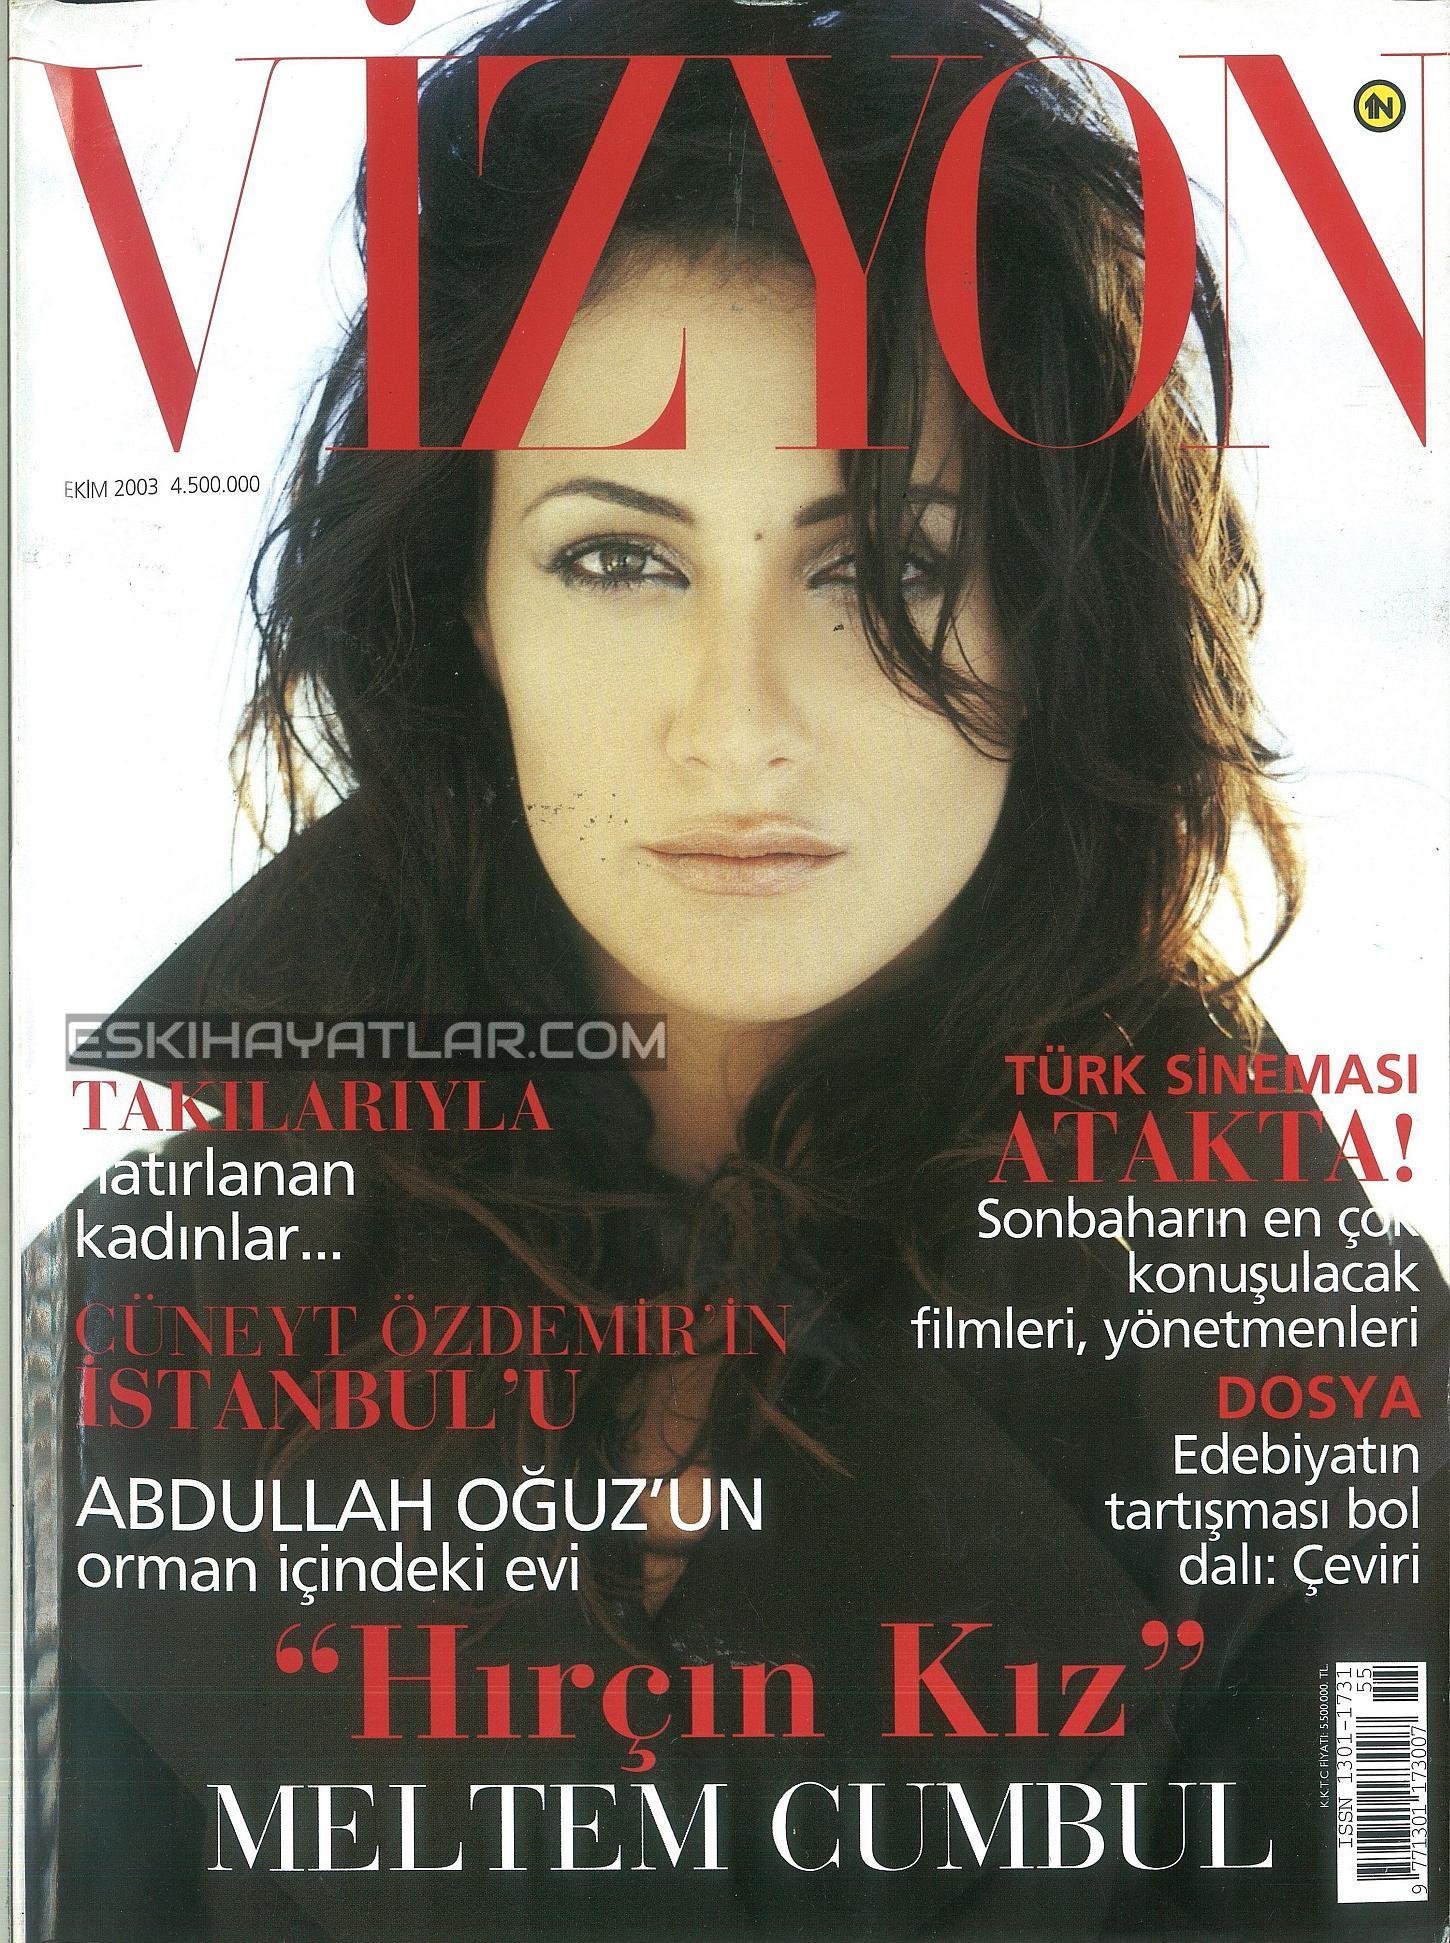 meltem-cumbul-roportaji-abdulhamit-duserken-karisik-pizza-filmi-2003-vizyon-dergisi (2)